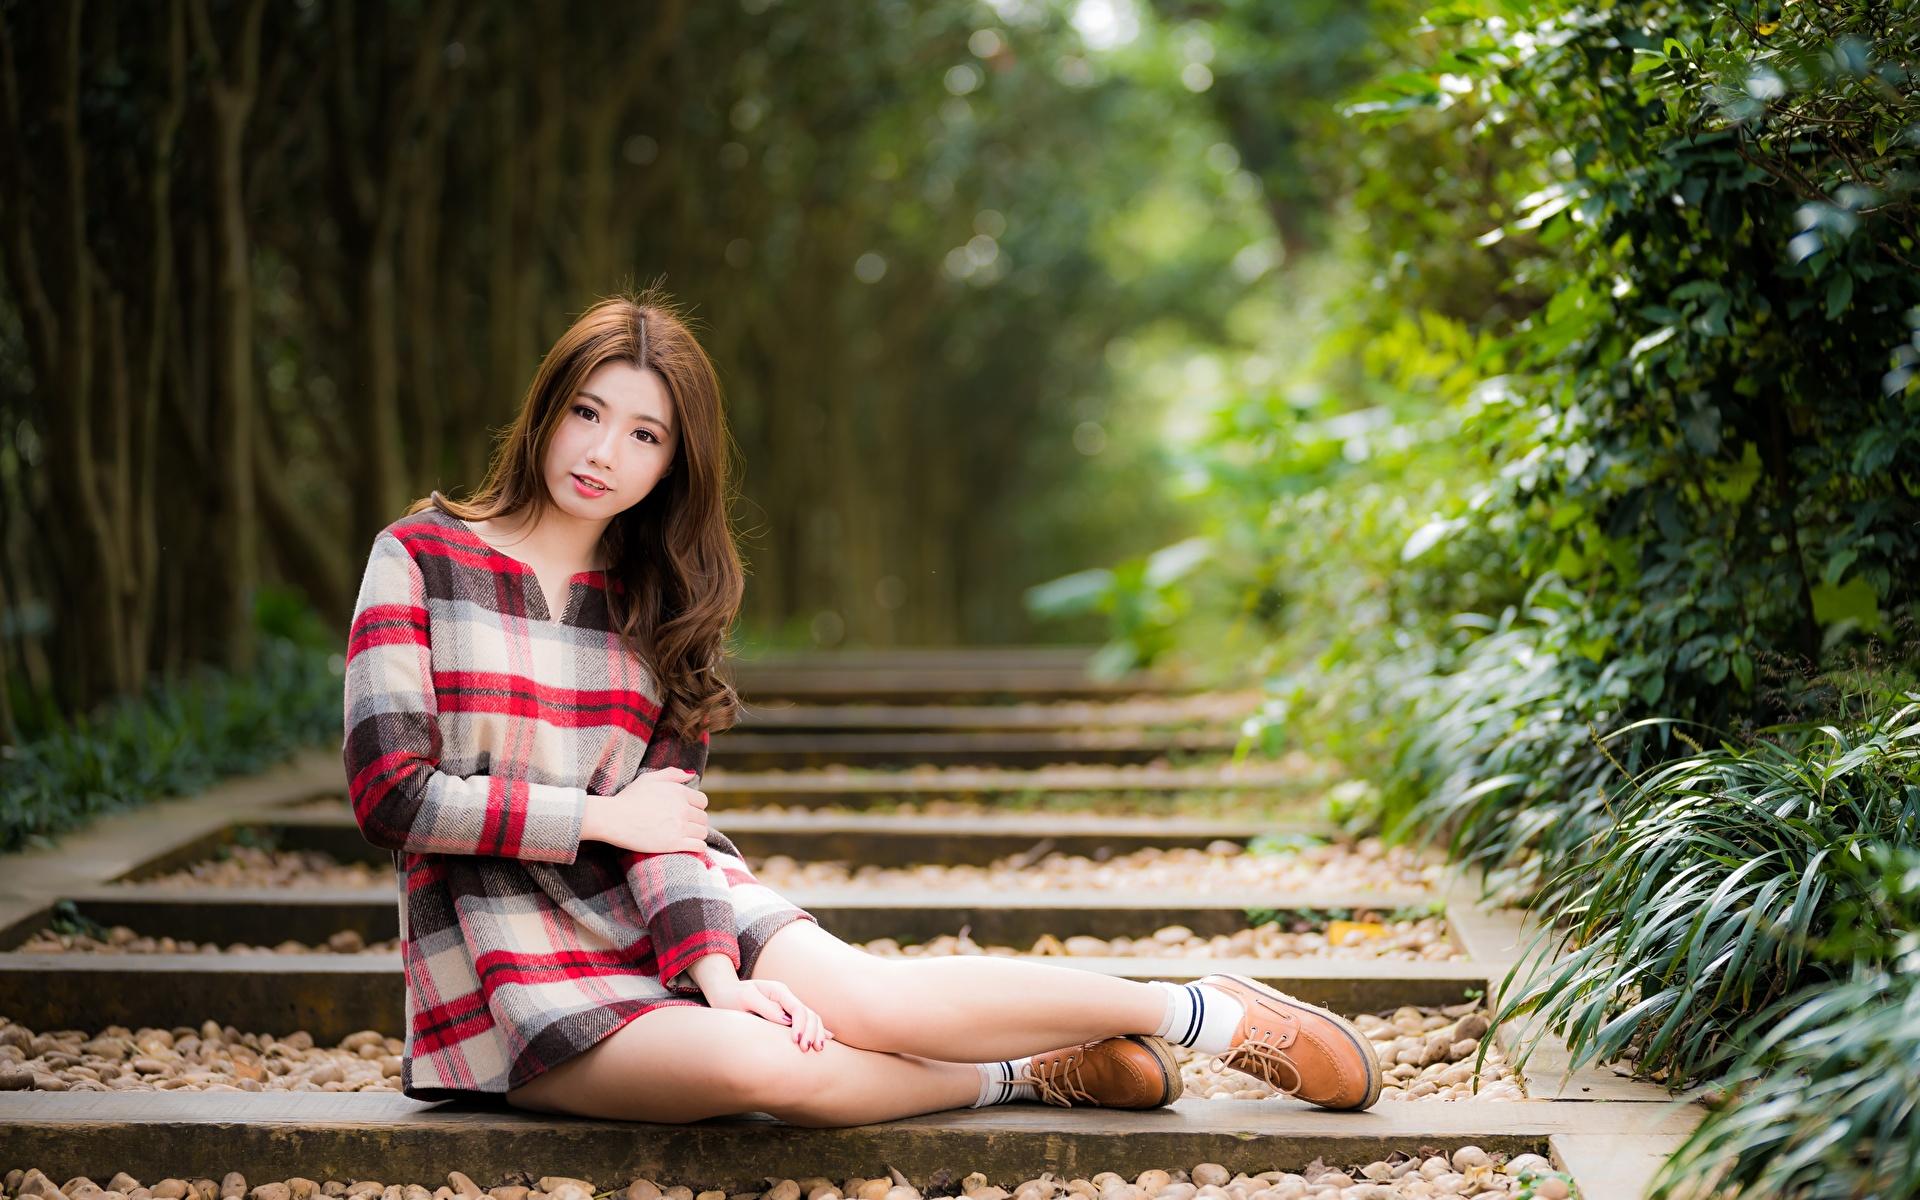 1920x1200 Asiático Bokeh Cabello castaño Sentado Mano Pierna mujer joven, mujeres jóvenes, asiática, pelo castaño, sentada, fondo borroso Chicas